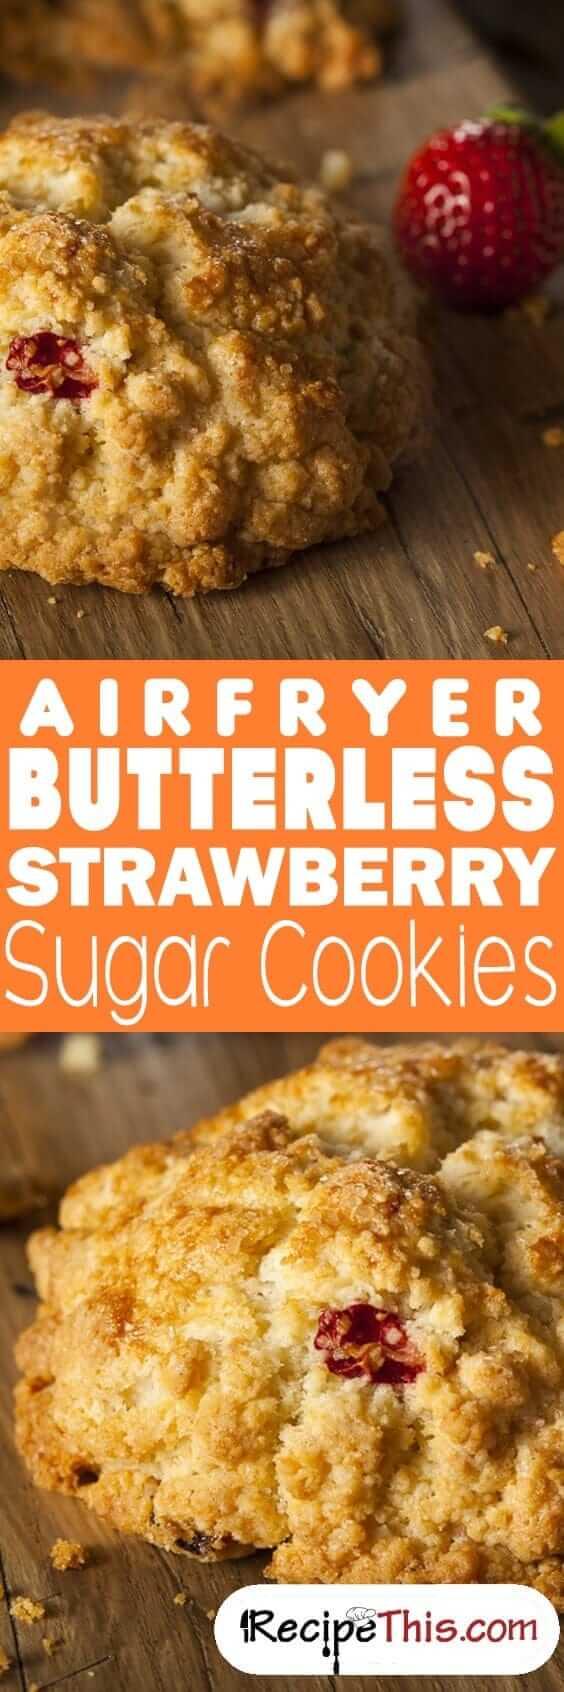 Airfryer Butterless Strawberry Sugar Cookies